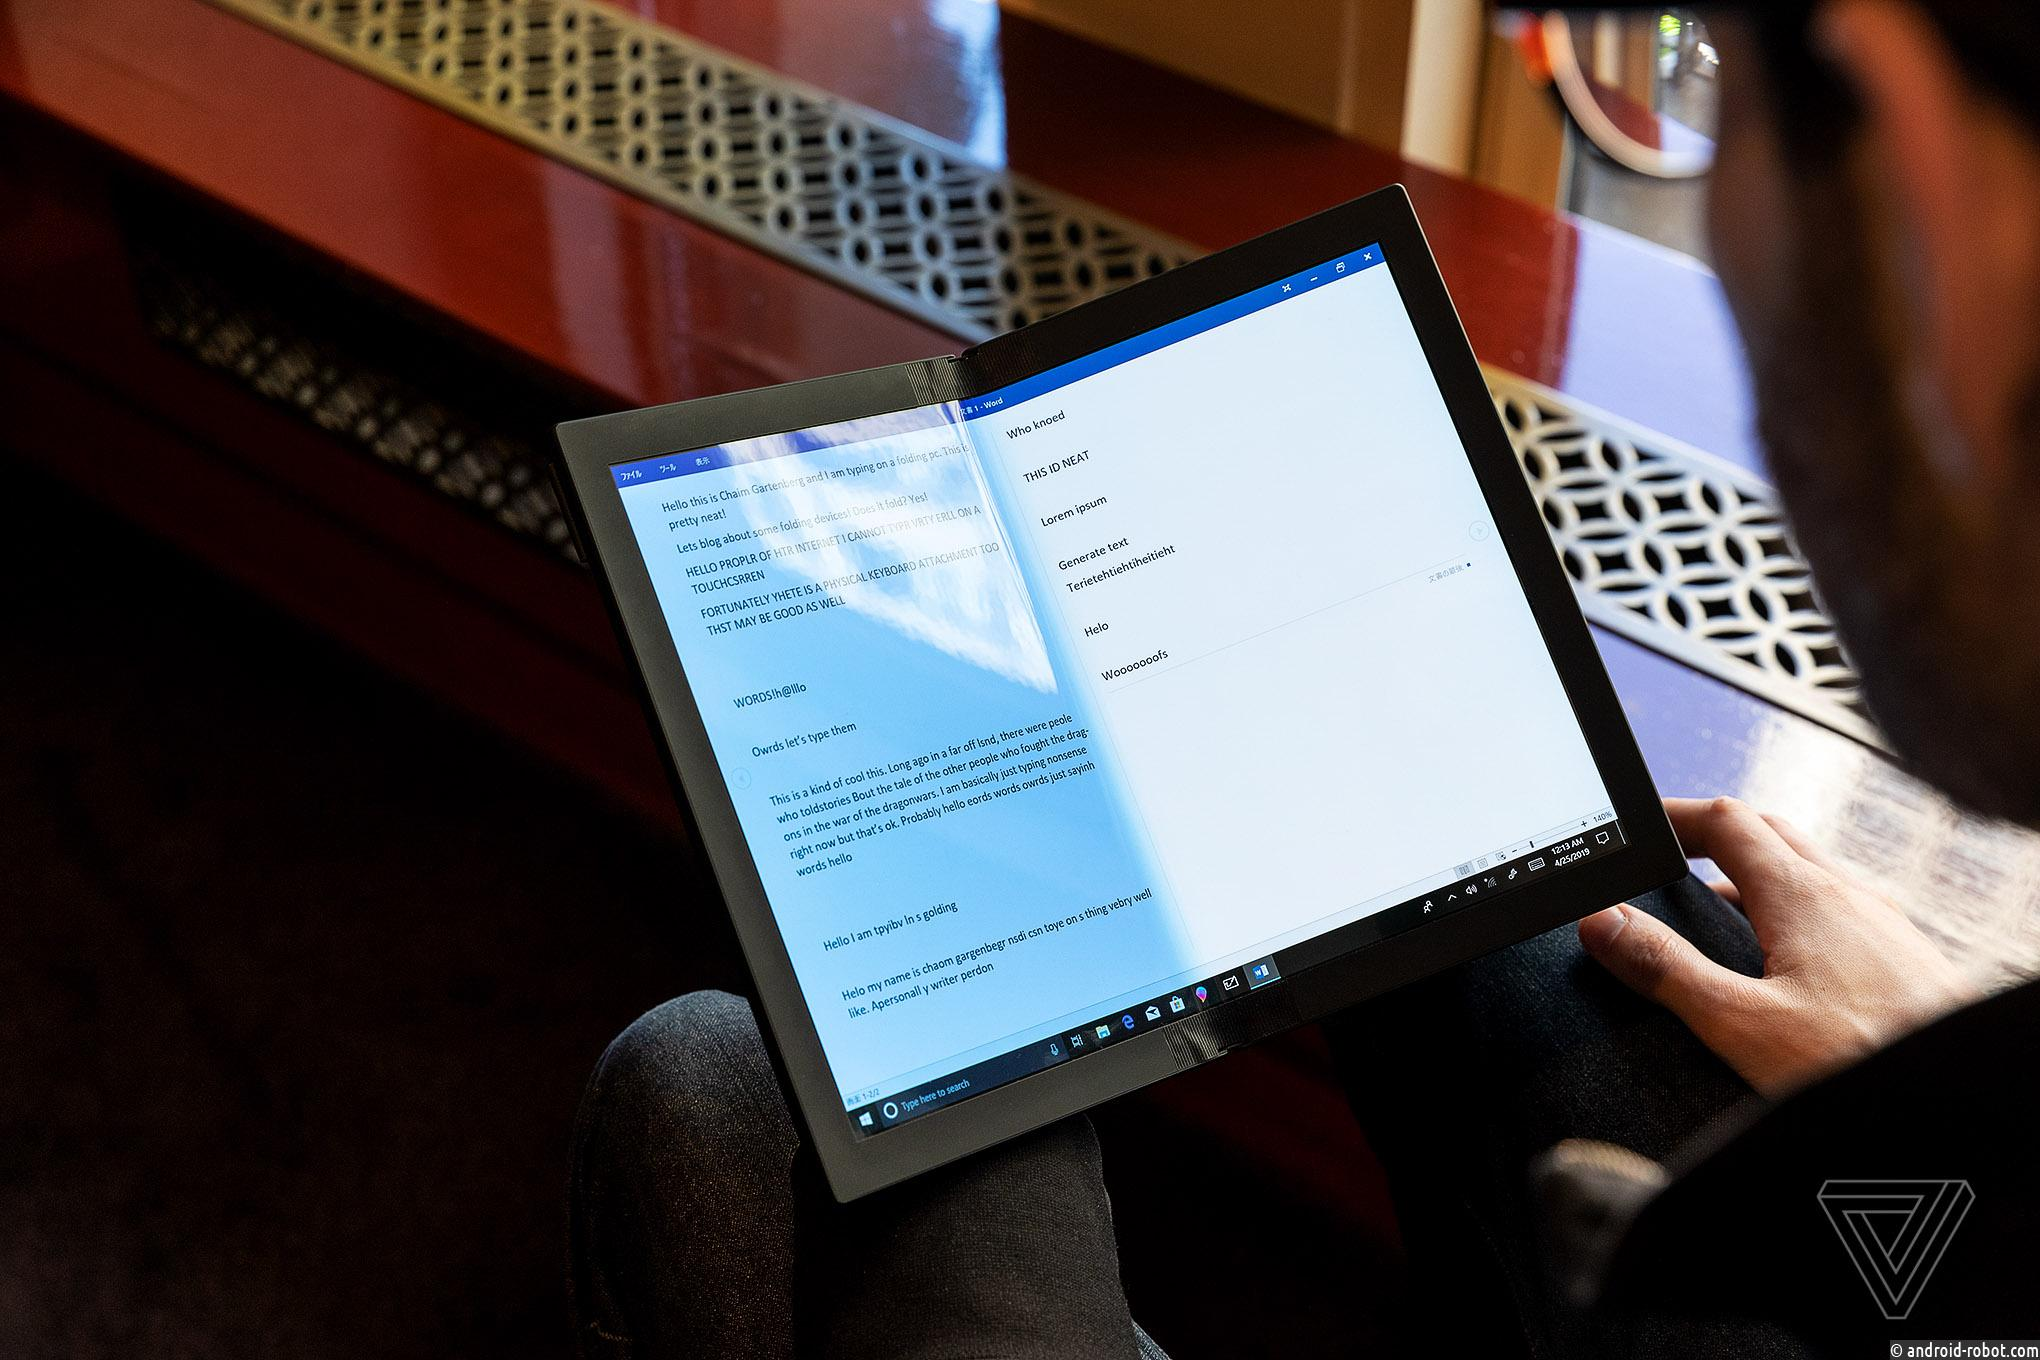 Lenovo представила первый вмире ноутбук сгибким дисплеем